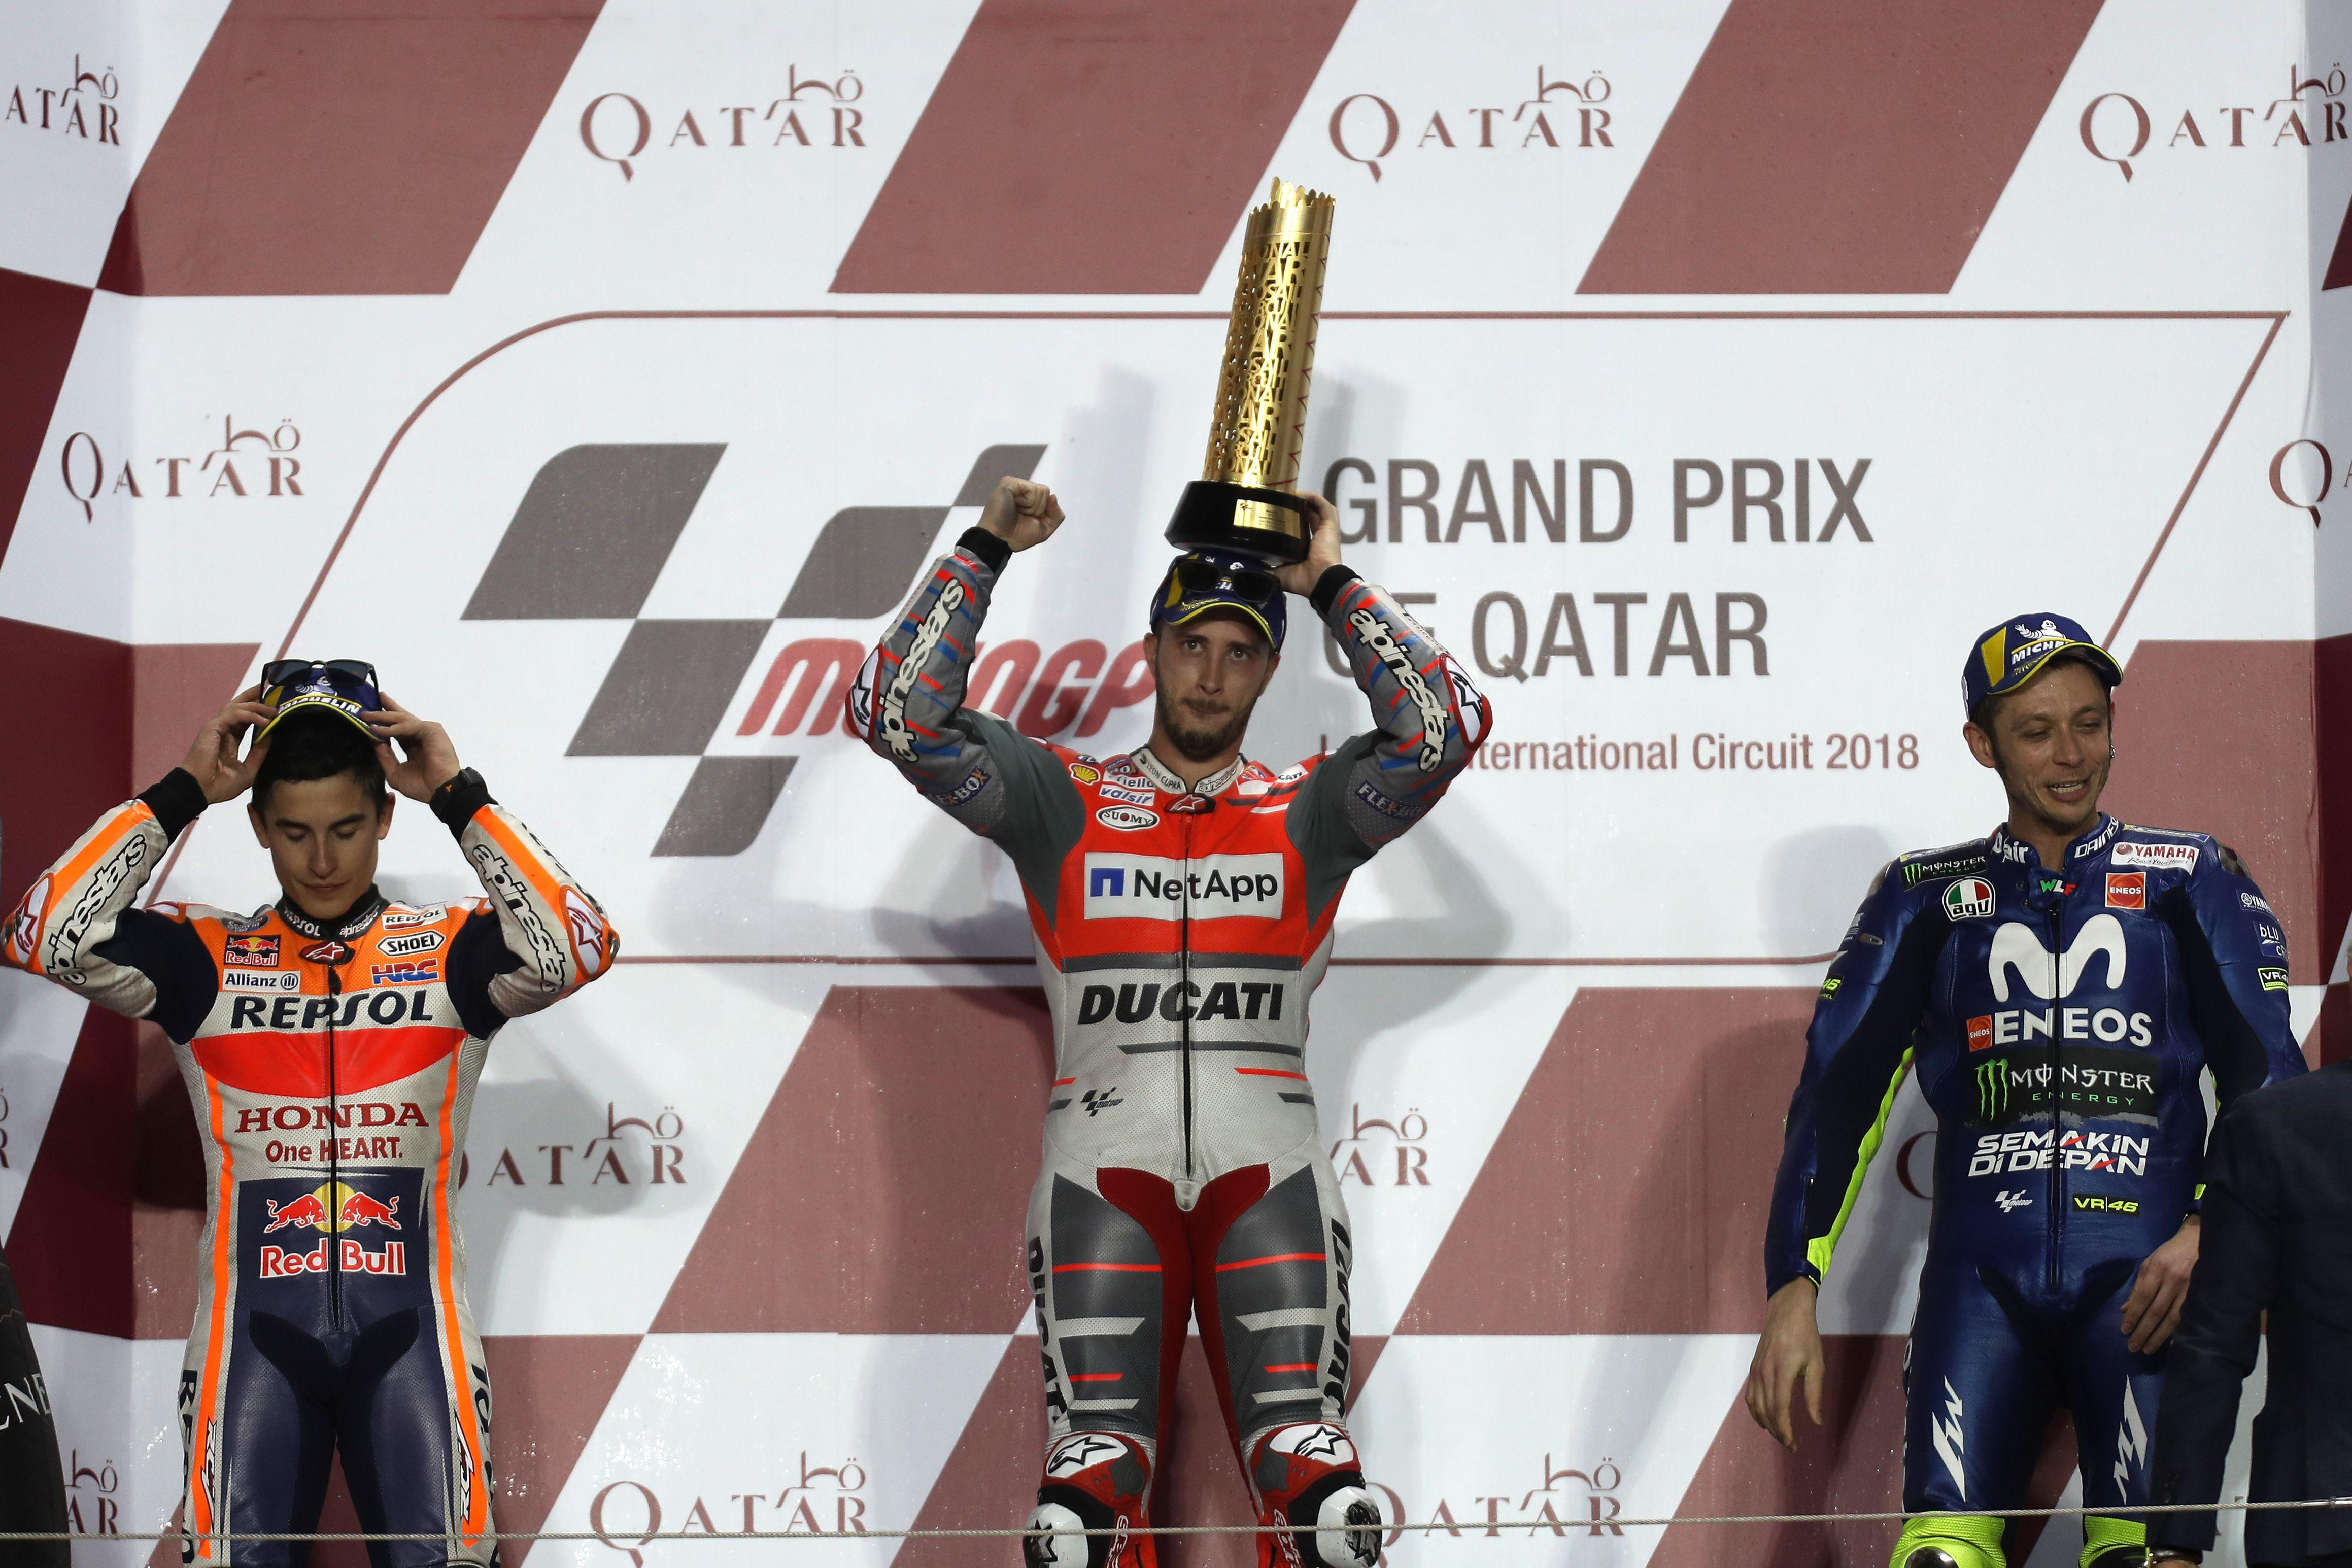 Andrea Dovizioso edged out Marc Marquez to win in Qatar